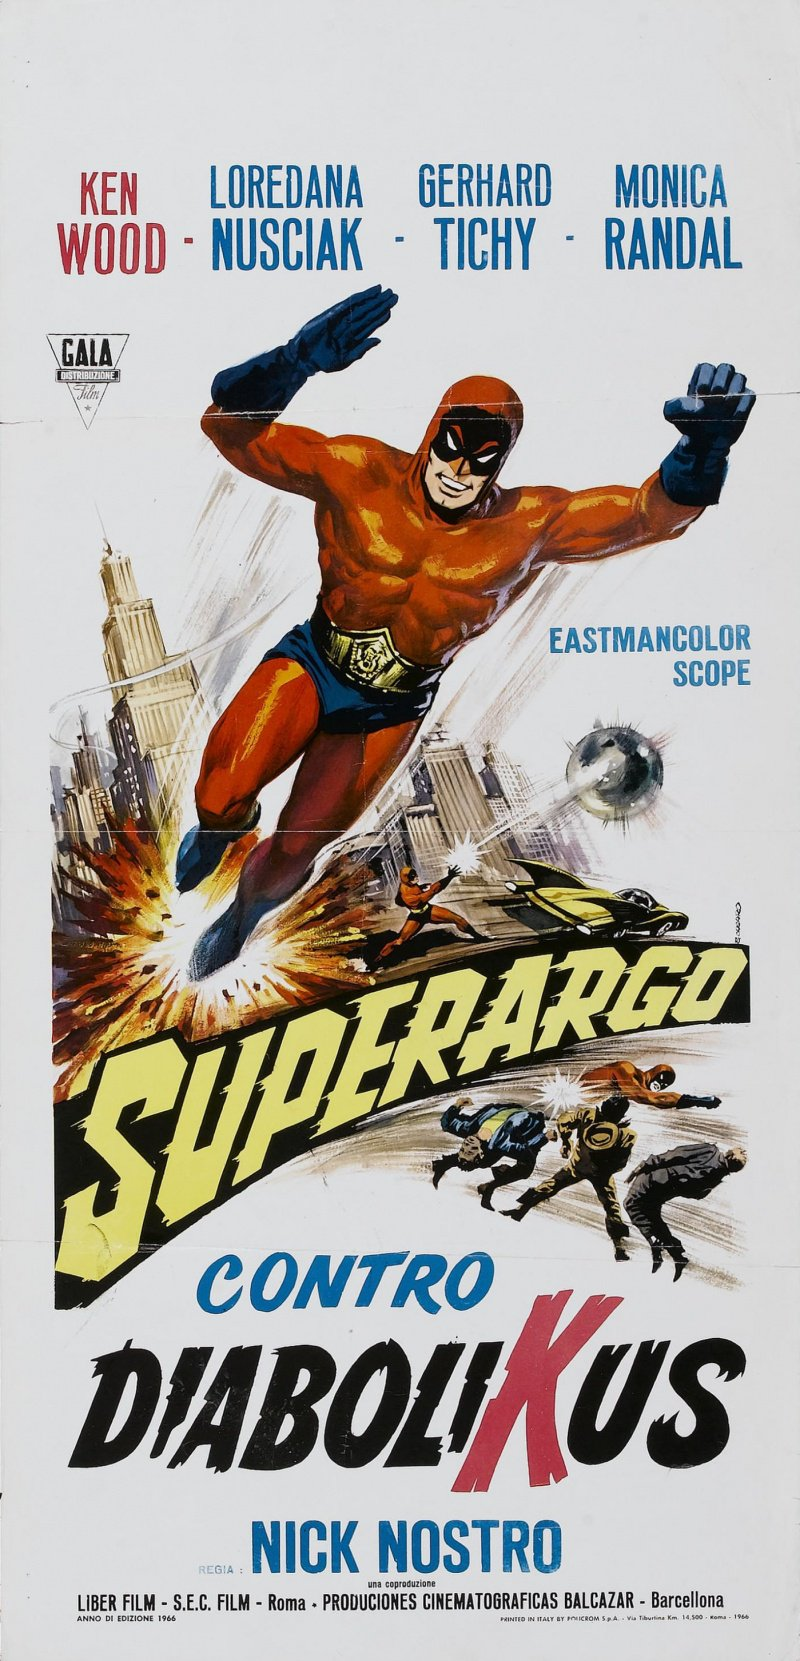 Постер Суперарго против Диаболикуса